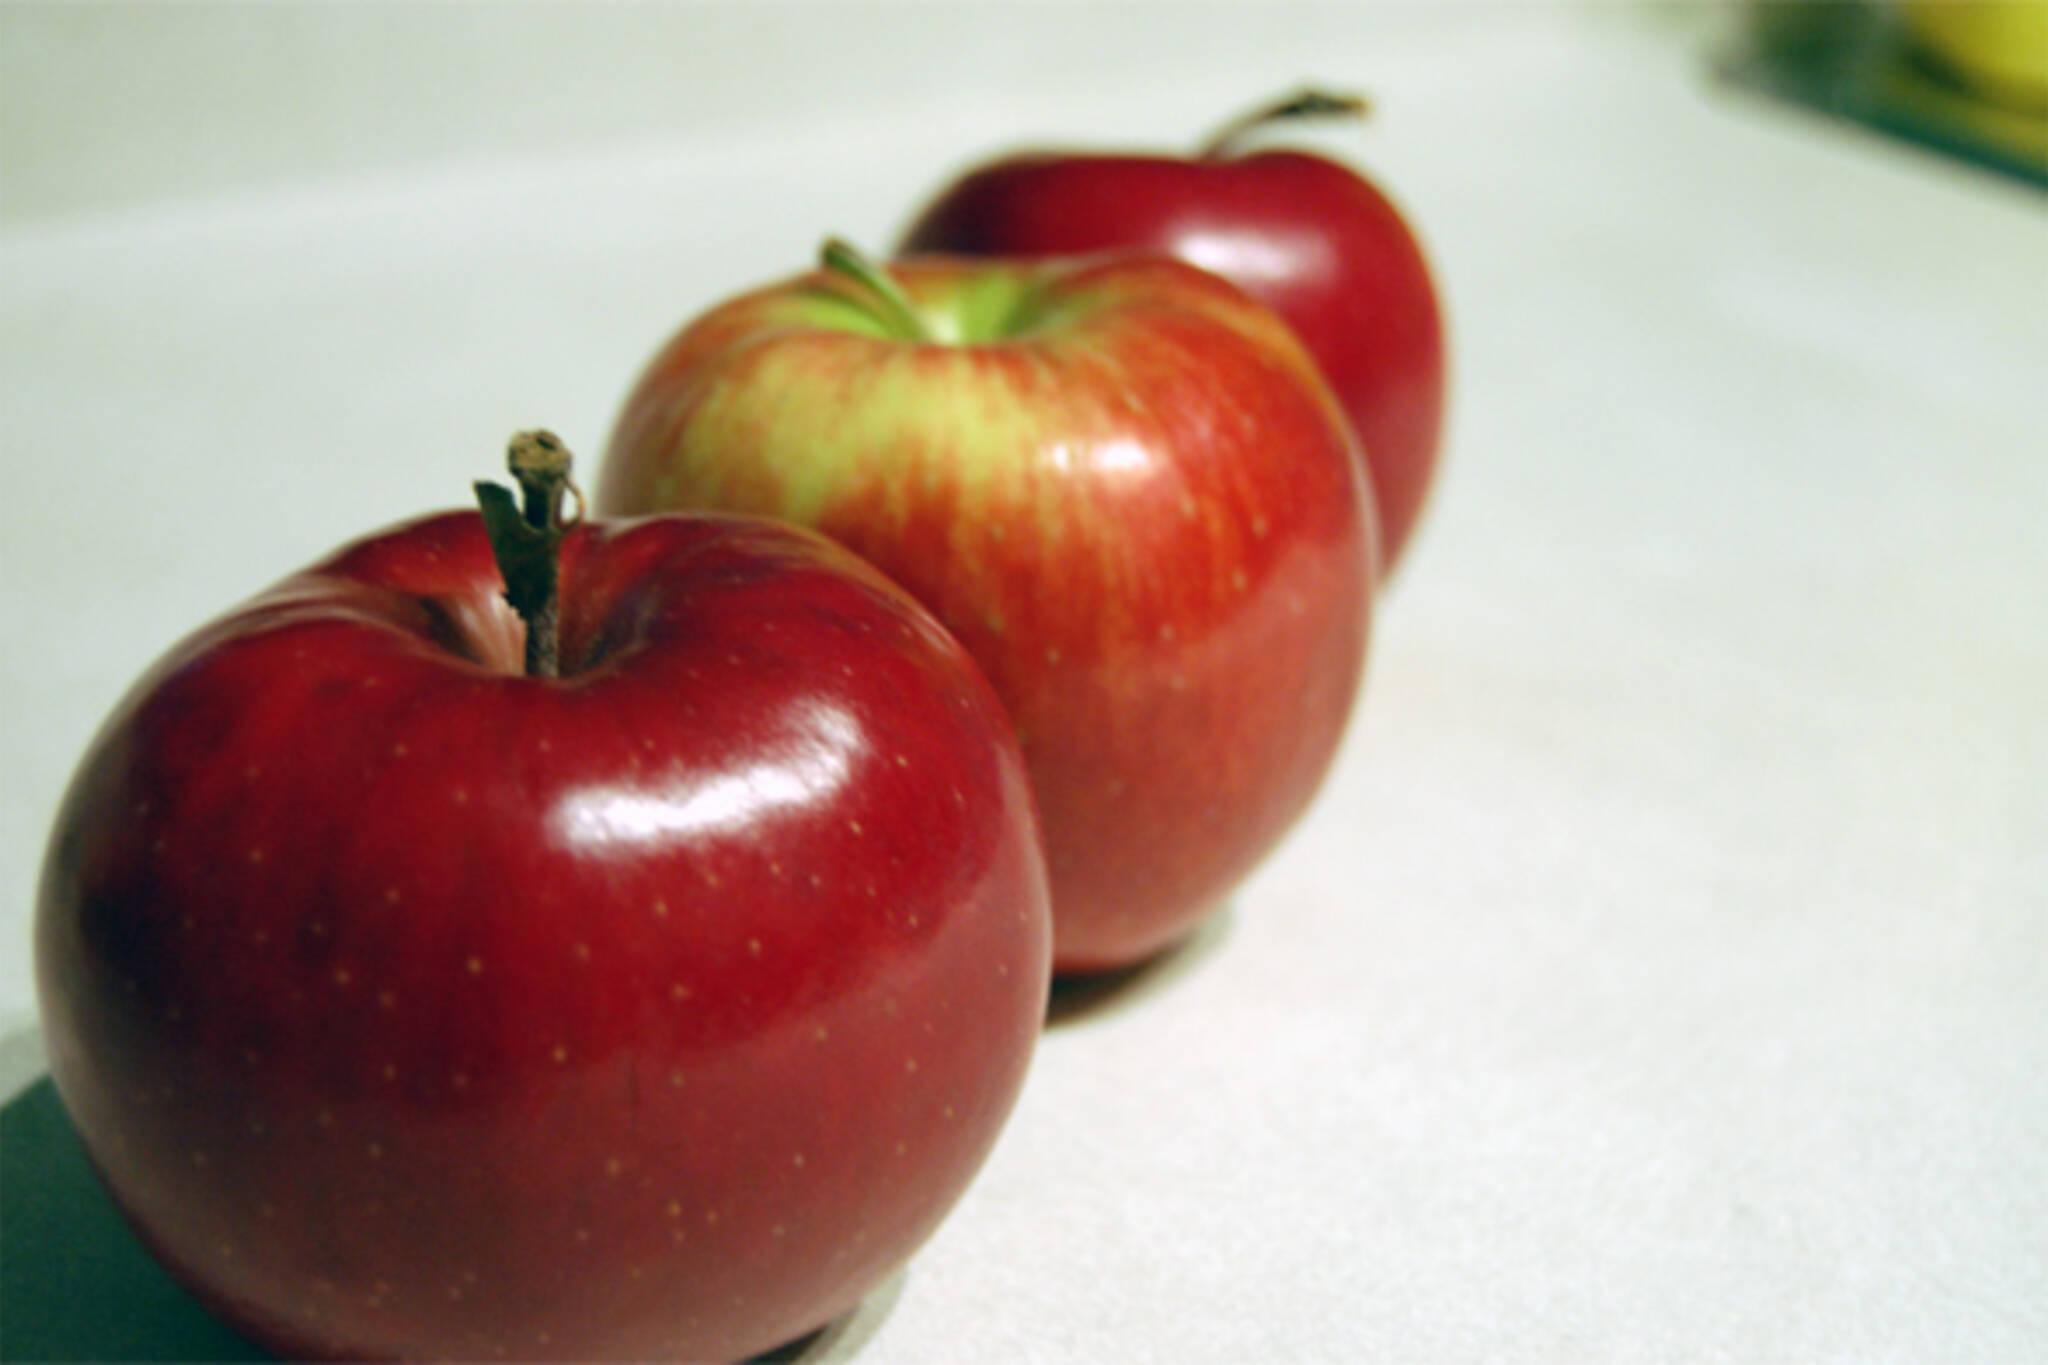 Red Prince Apple Toronto